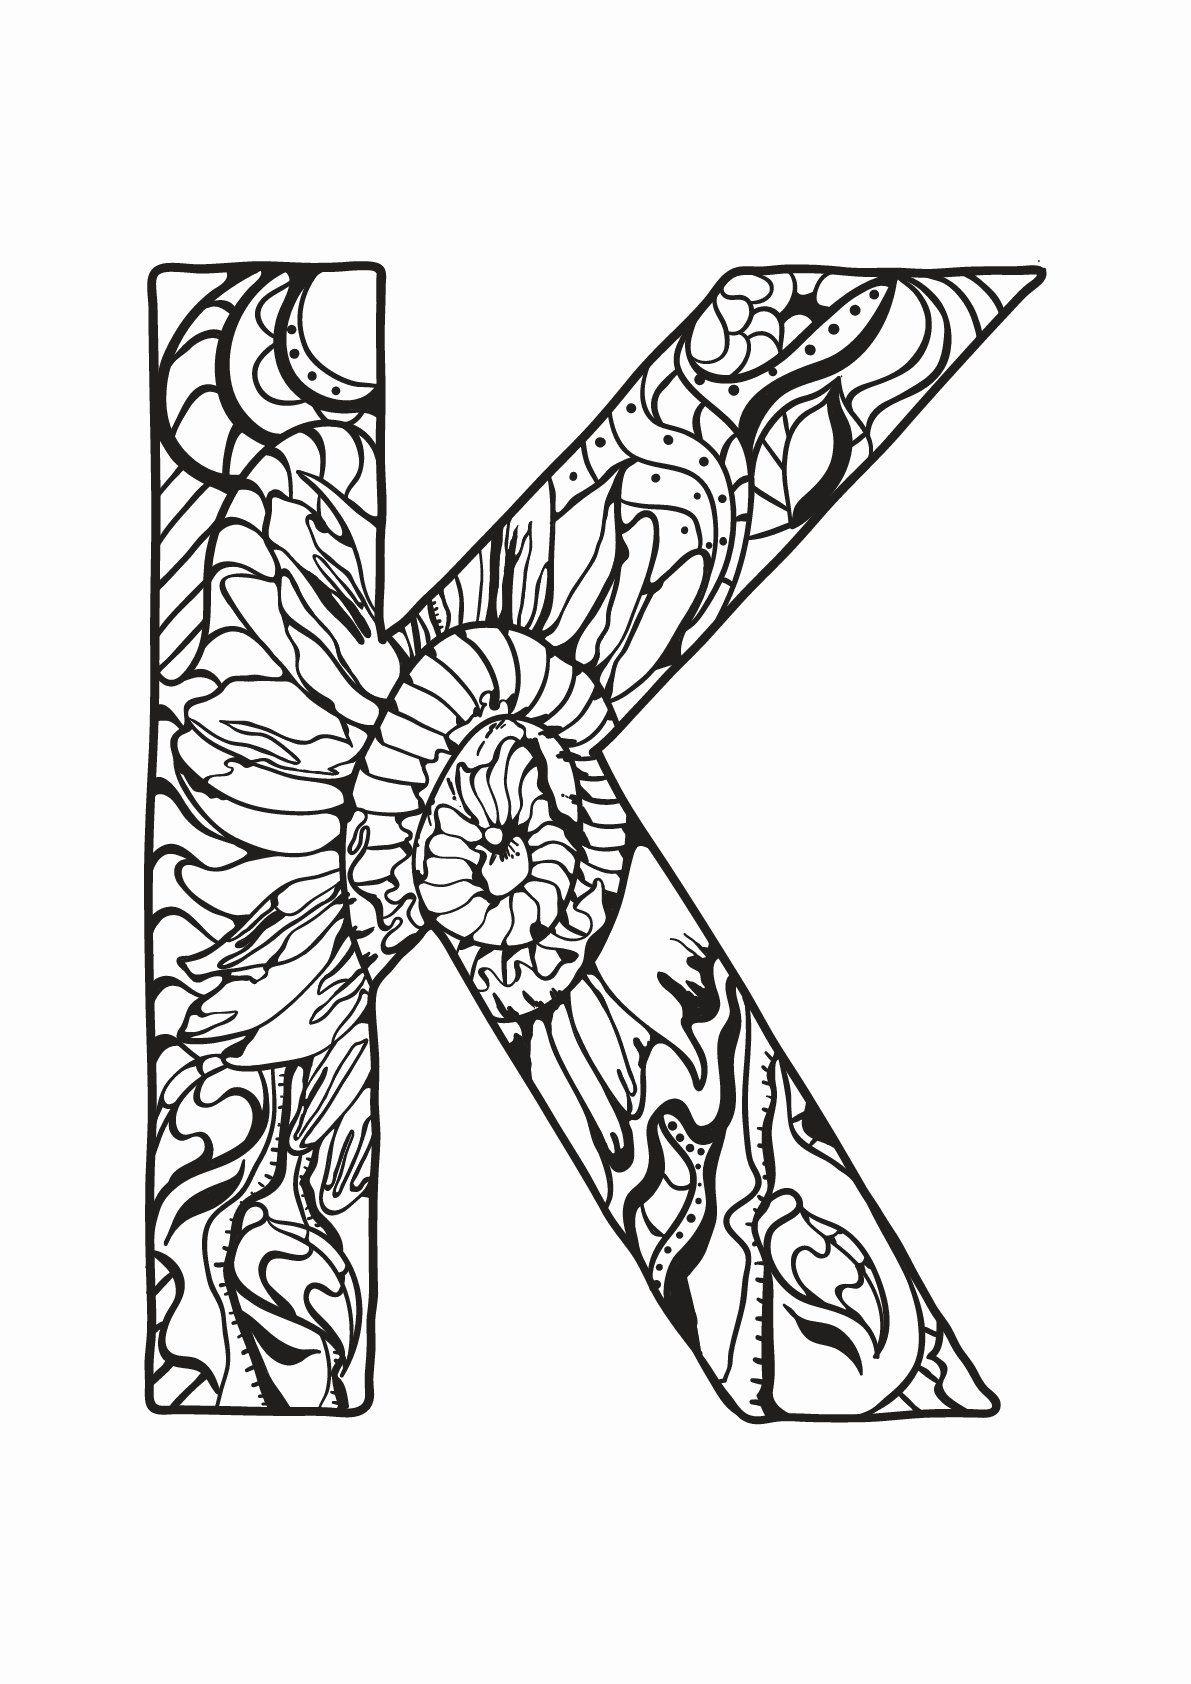 Pin By Katherine Tatis On Coloring Coloring Letters Coloring Pages Inspirational Coloring Pages